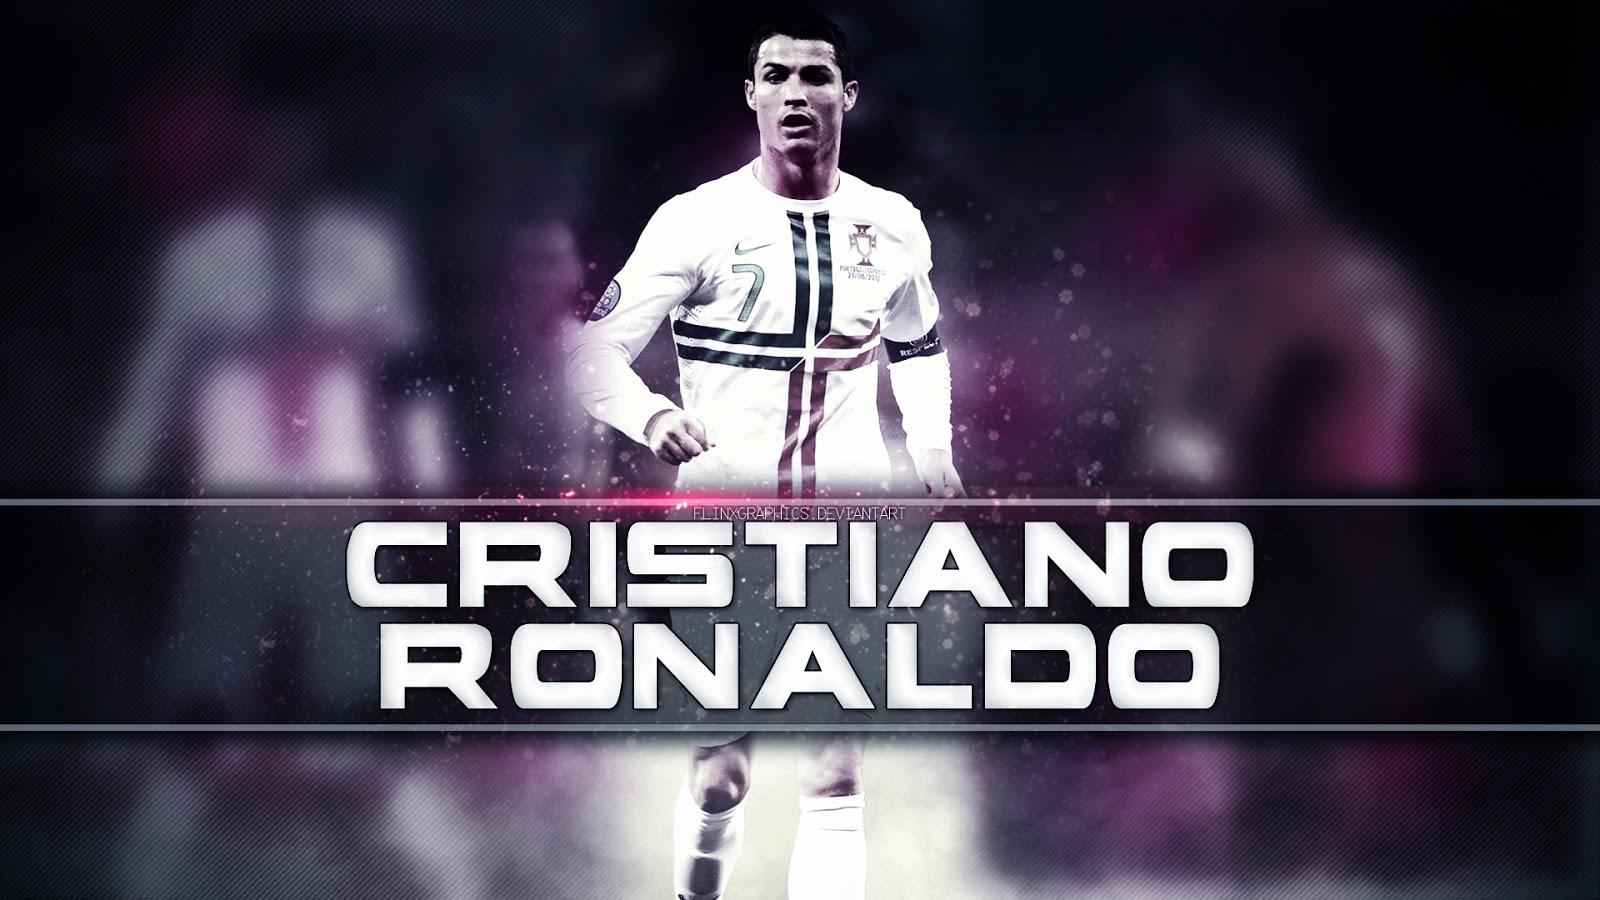 Cristiano Ronaldo New HD Wallpapers 2014-2015 | Football Wallpapers HD